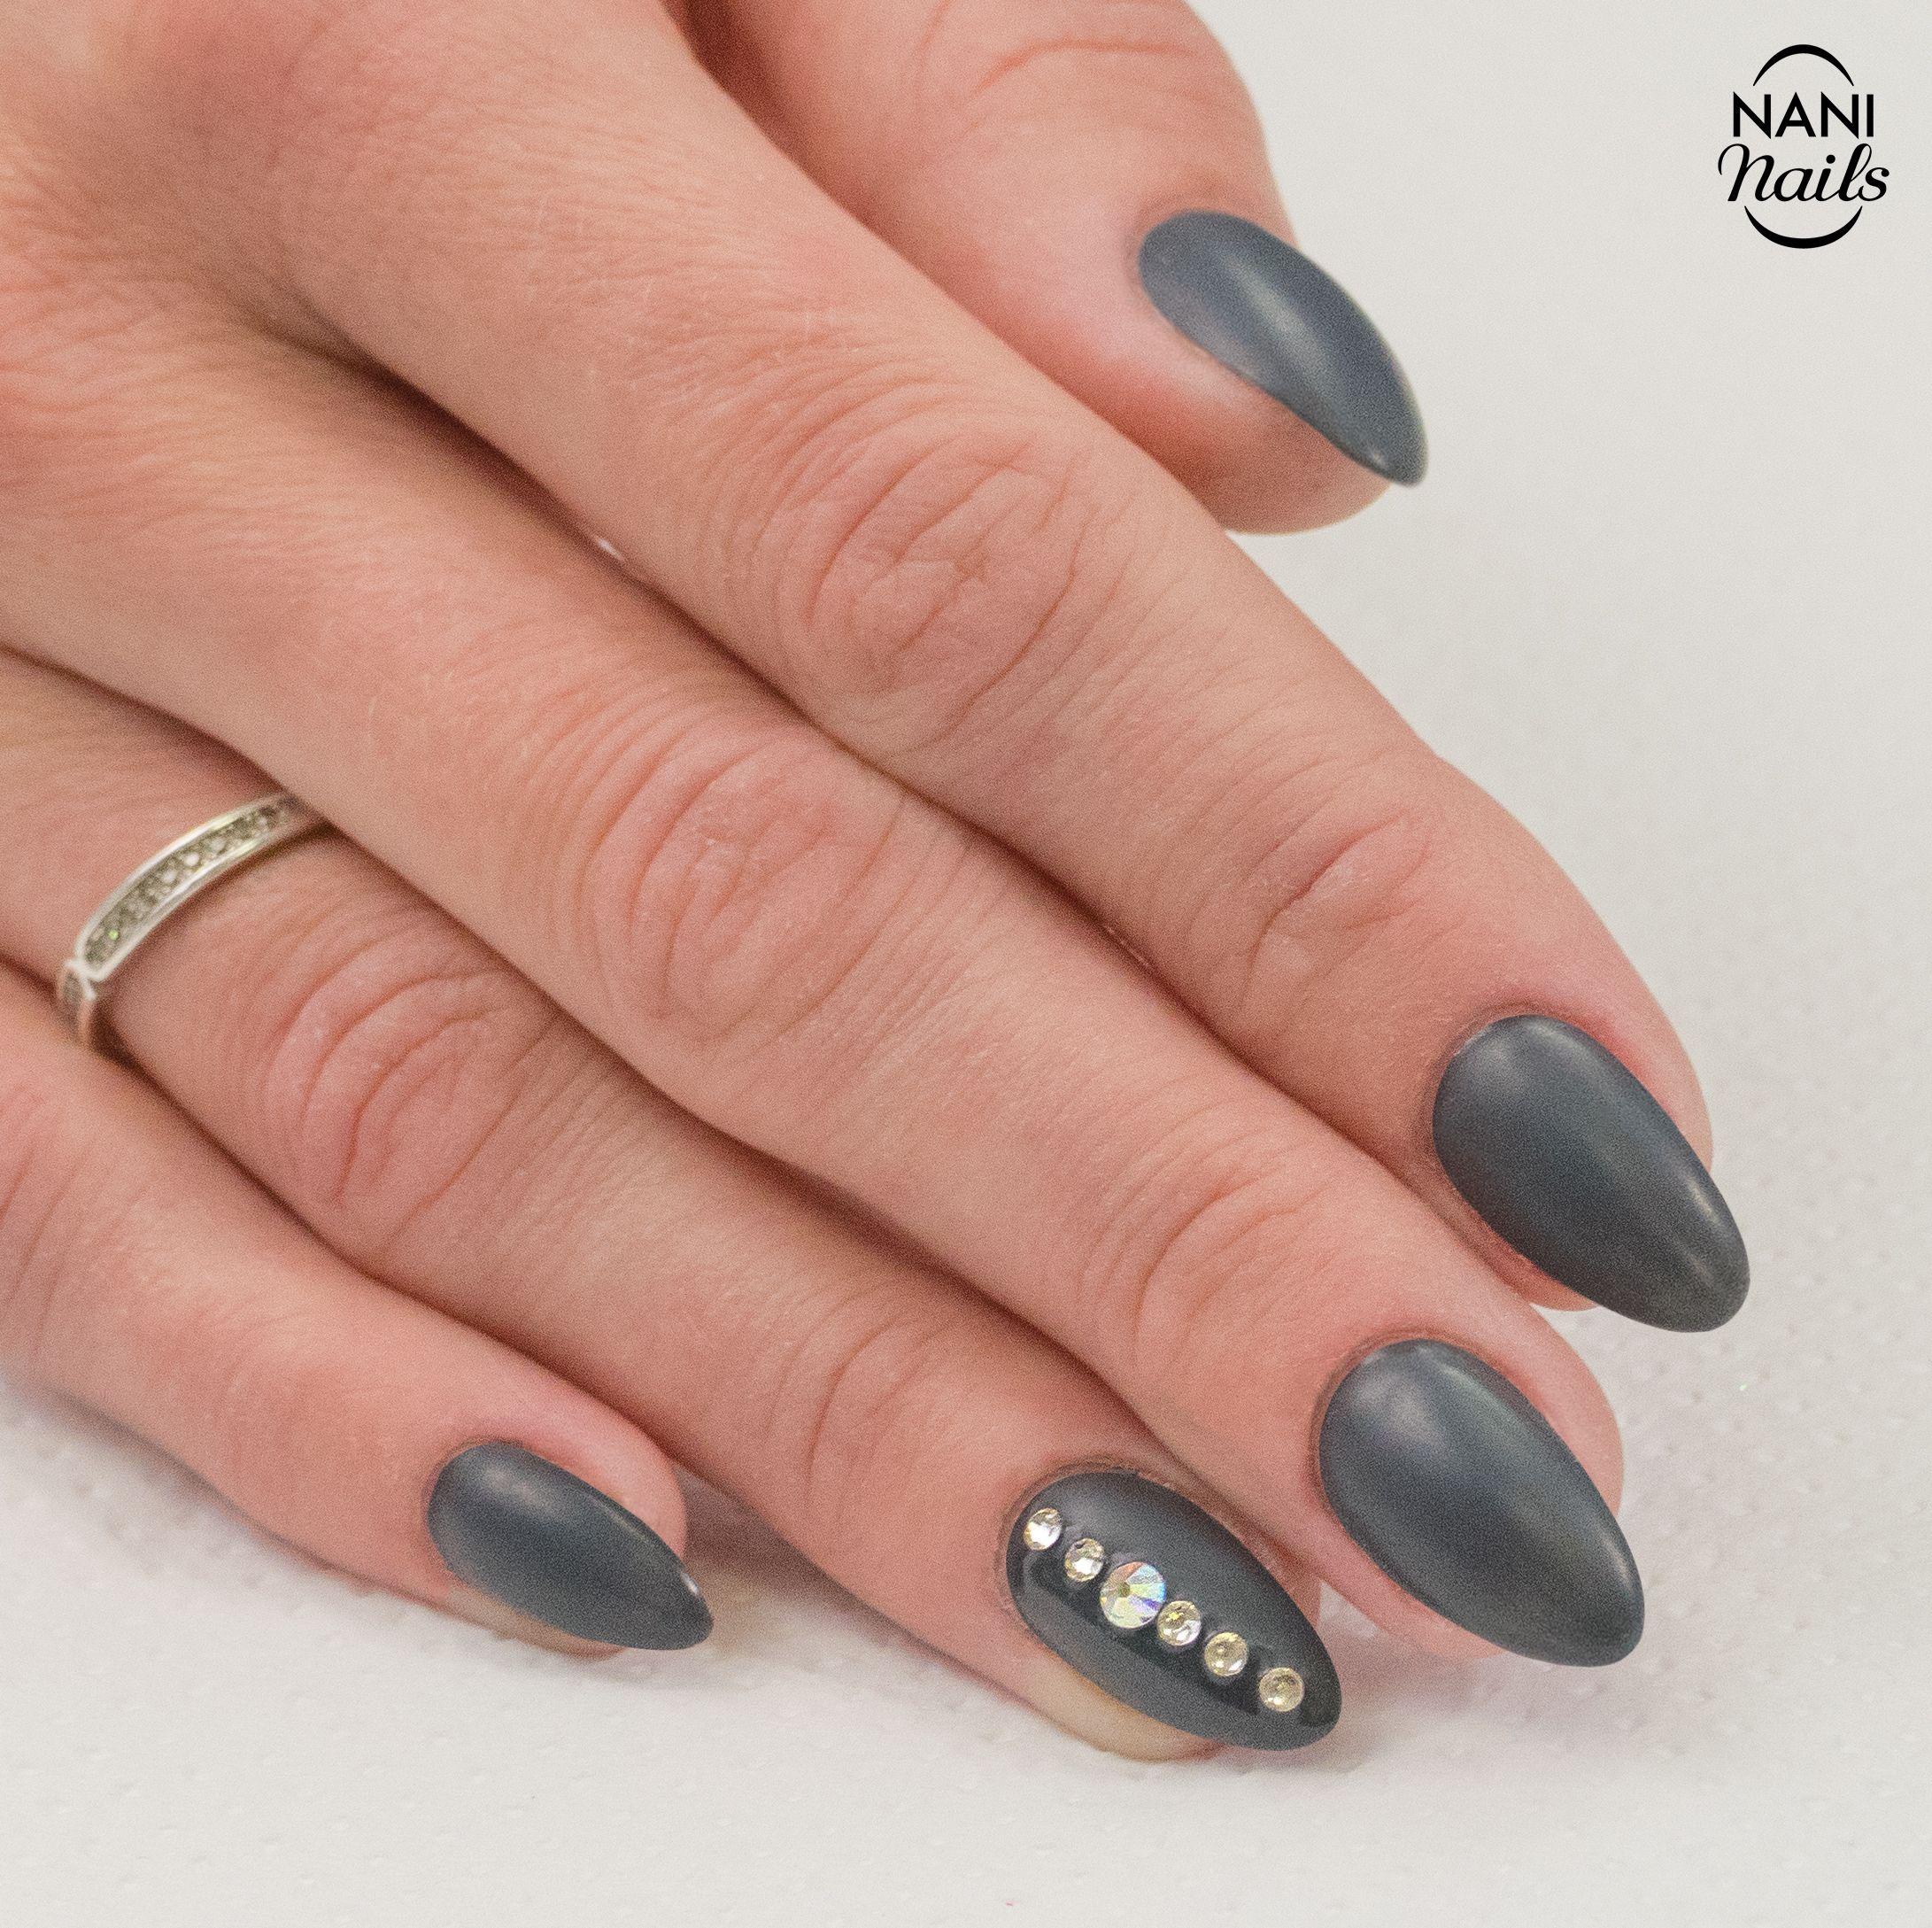 Back To Black Manicure Nails Swarovski Blacklove Gray Naninails Nehet Nail Art Manikura